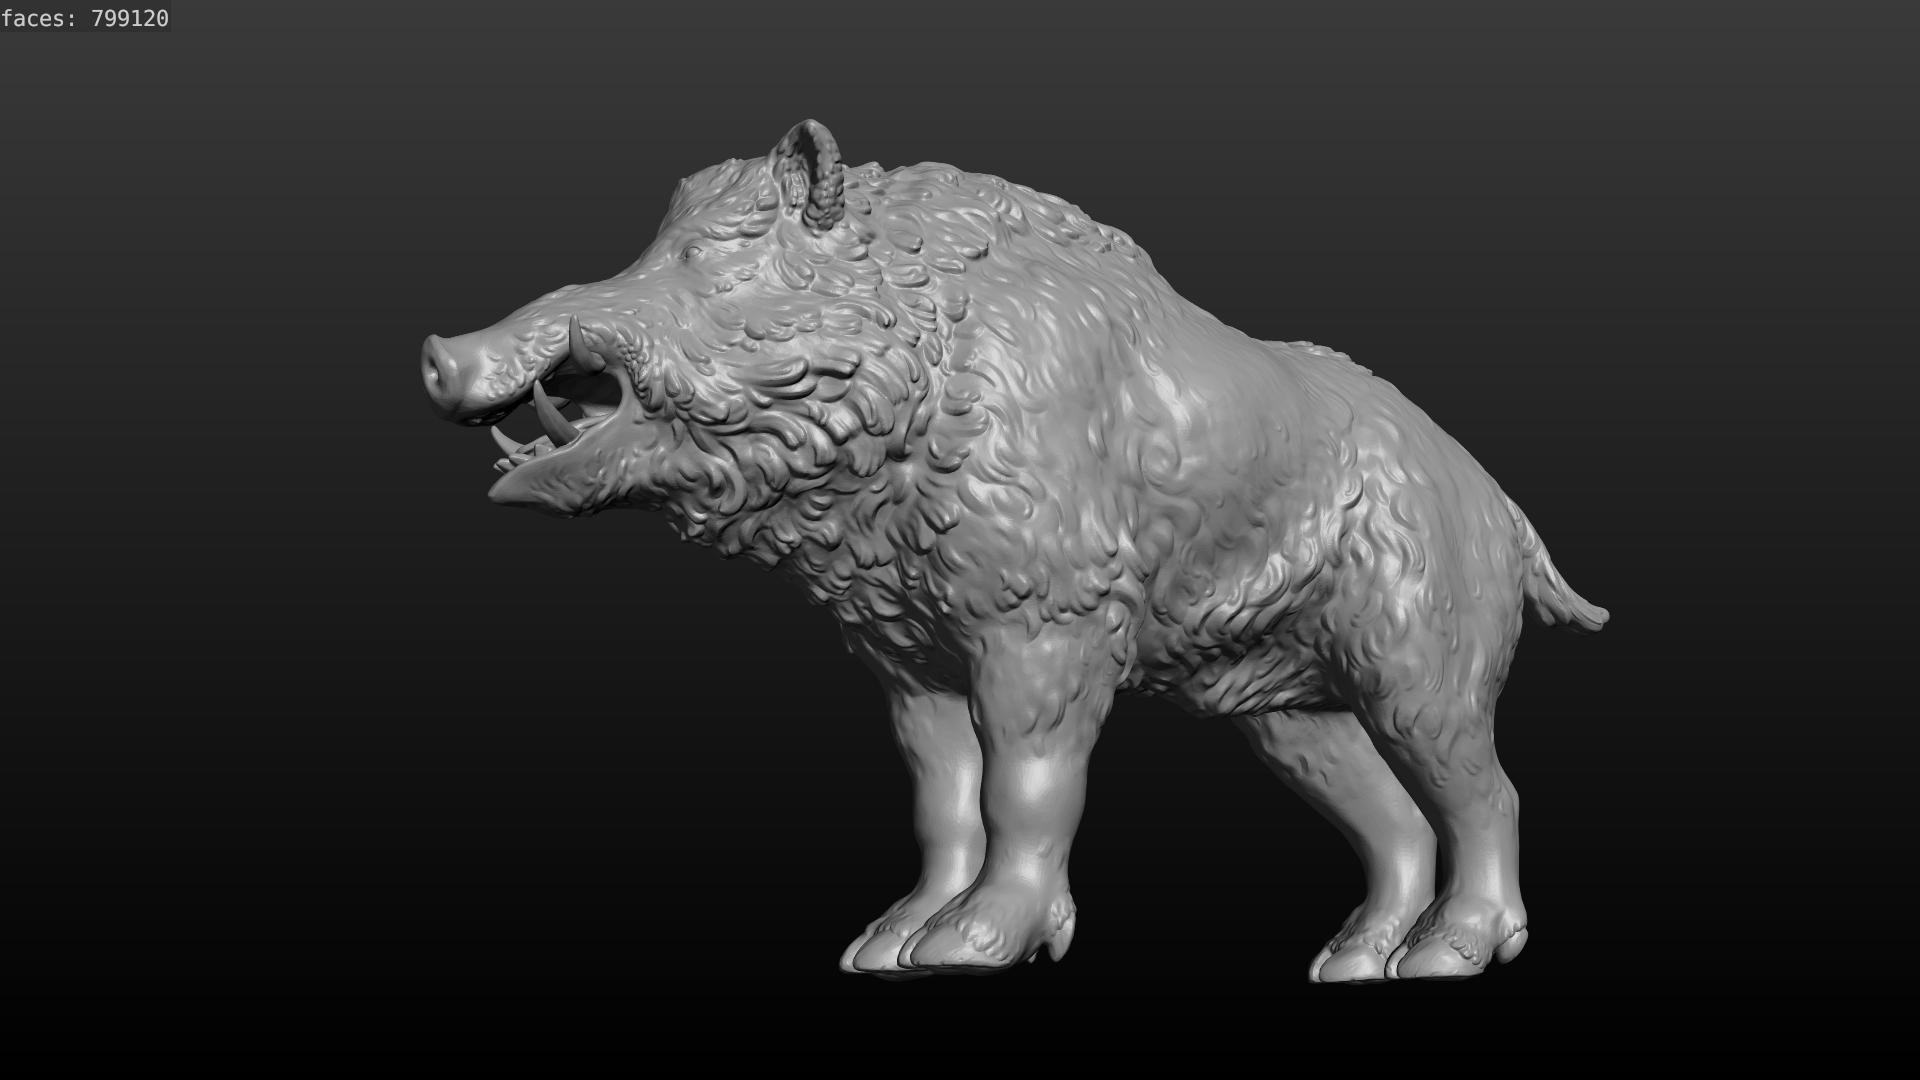 boar-14.png Download STL file Boar • 3D printable design, Skazok